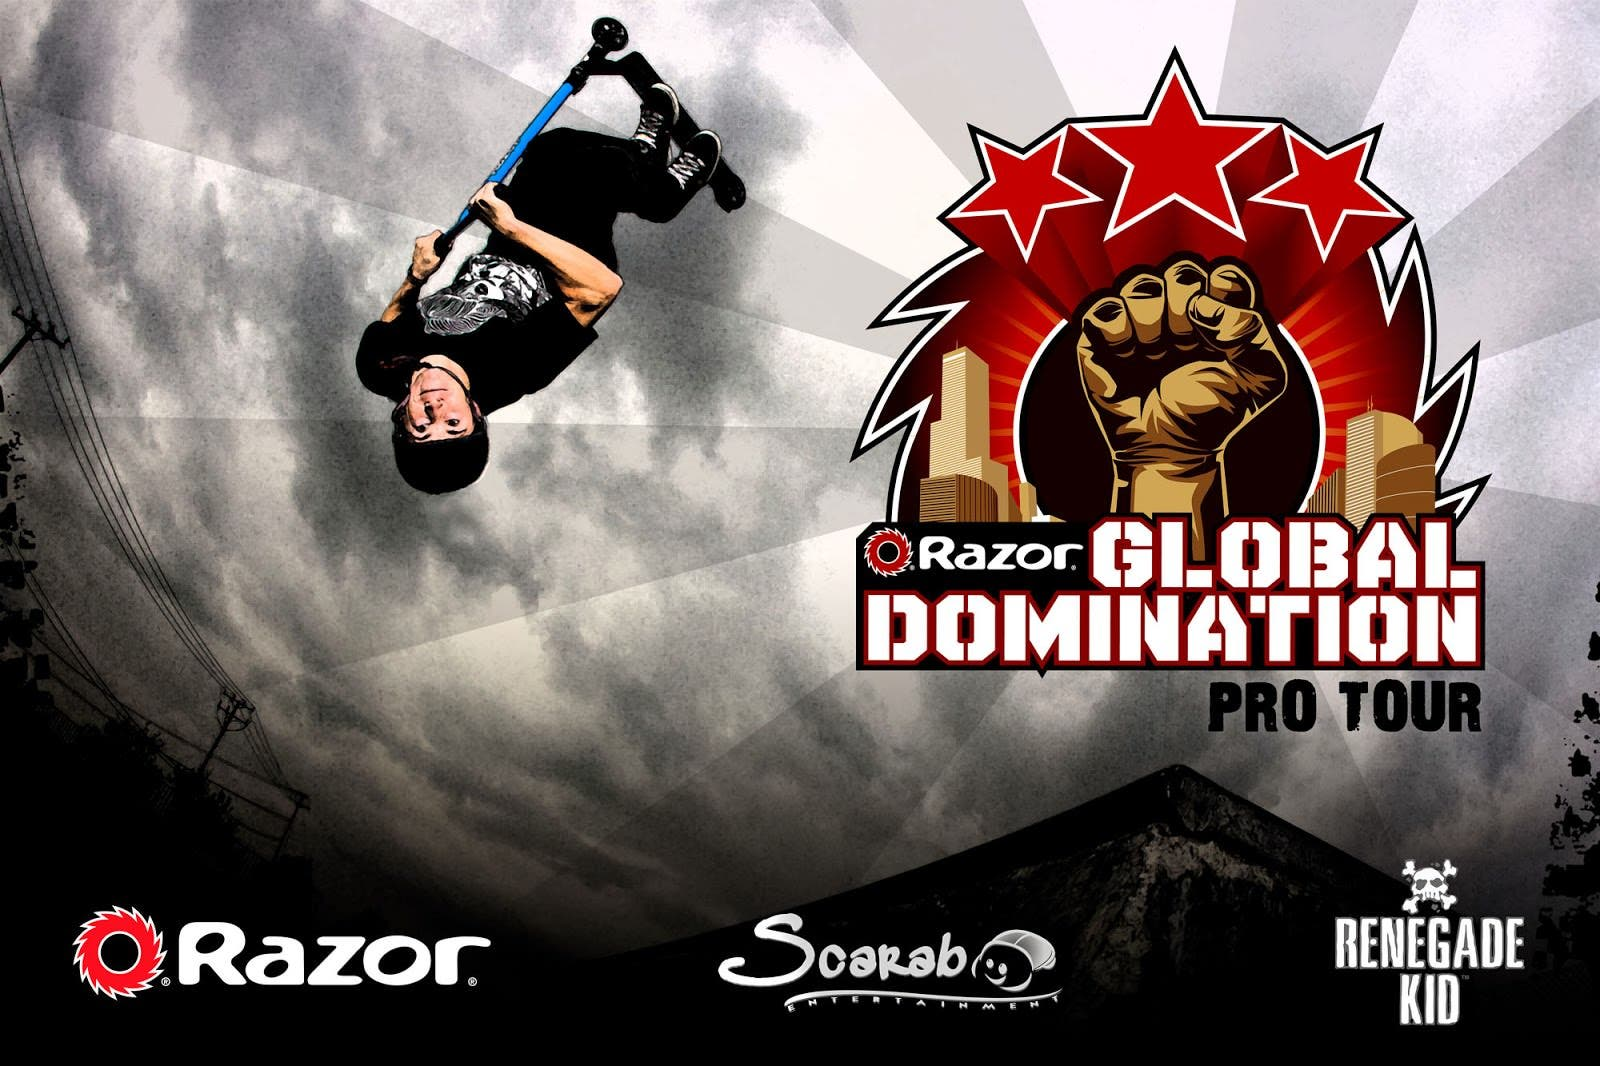 Trucos y acrobacias con Razor Global Domination Pro Tour para Wii U